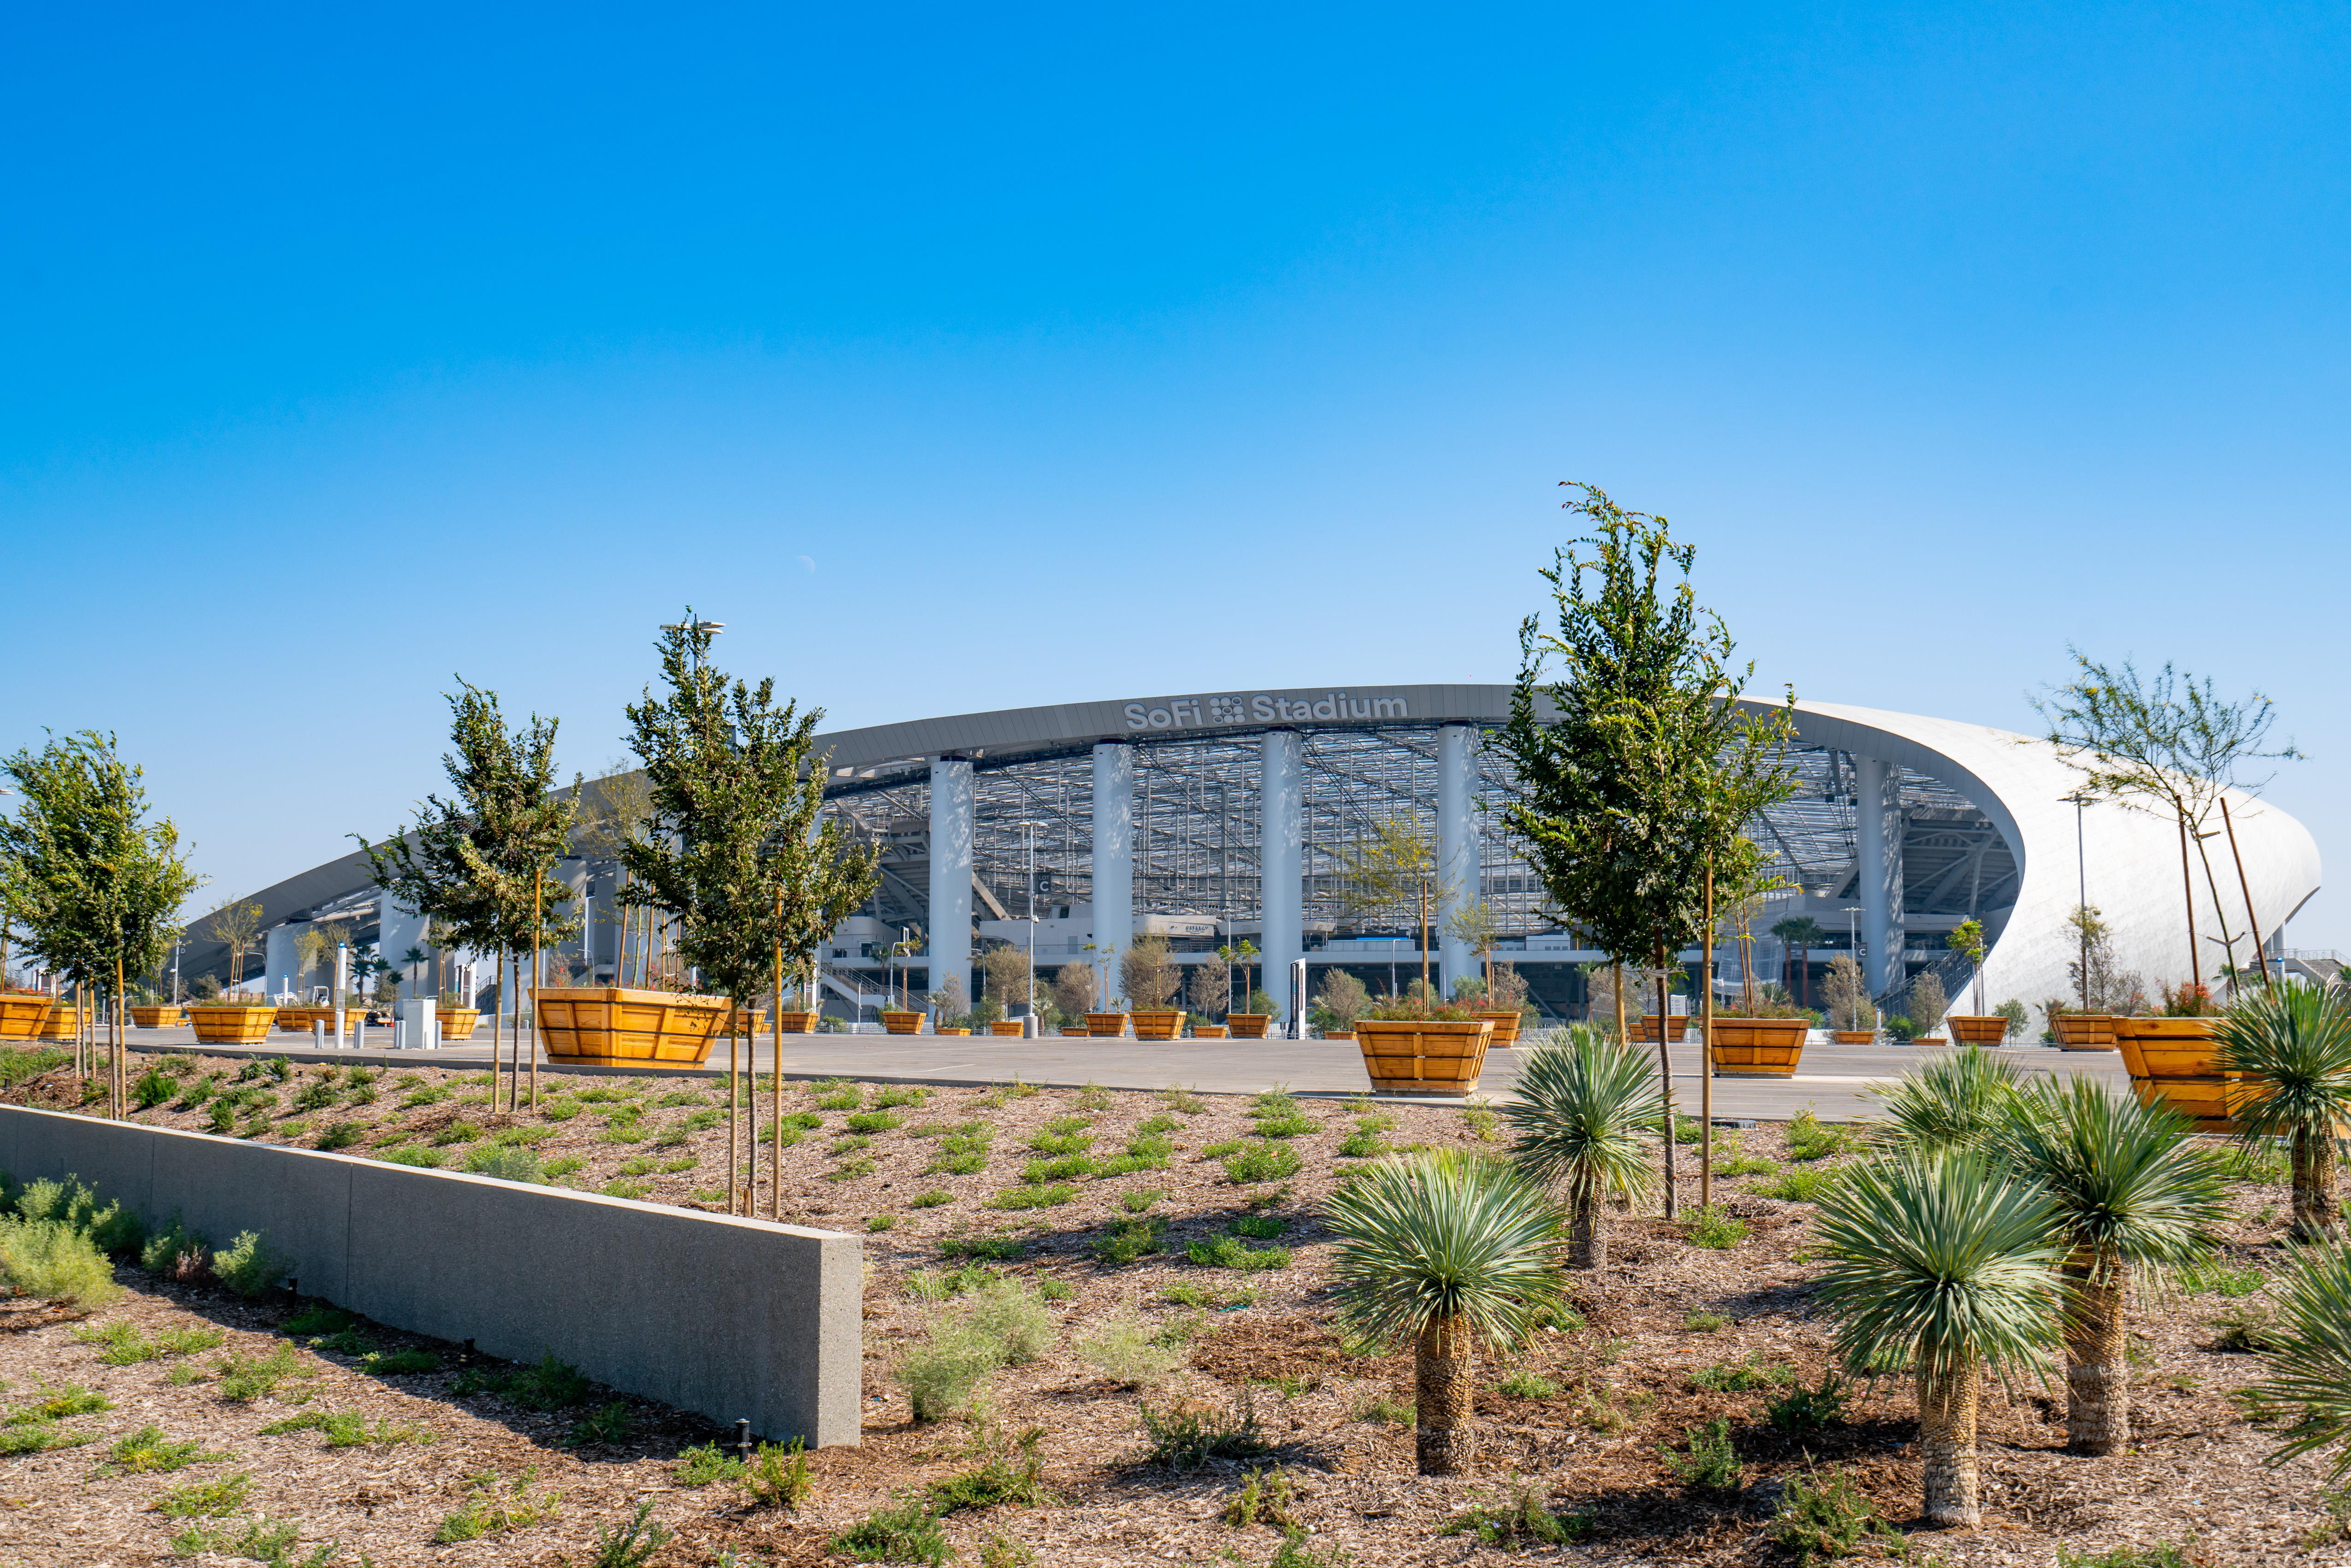 Inglewood Exteriors And Landmarks - 2020